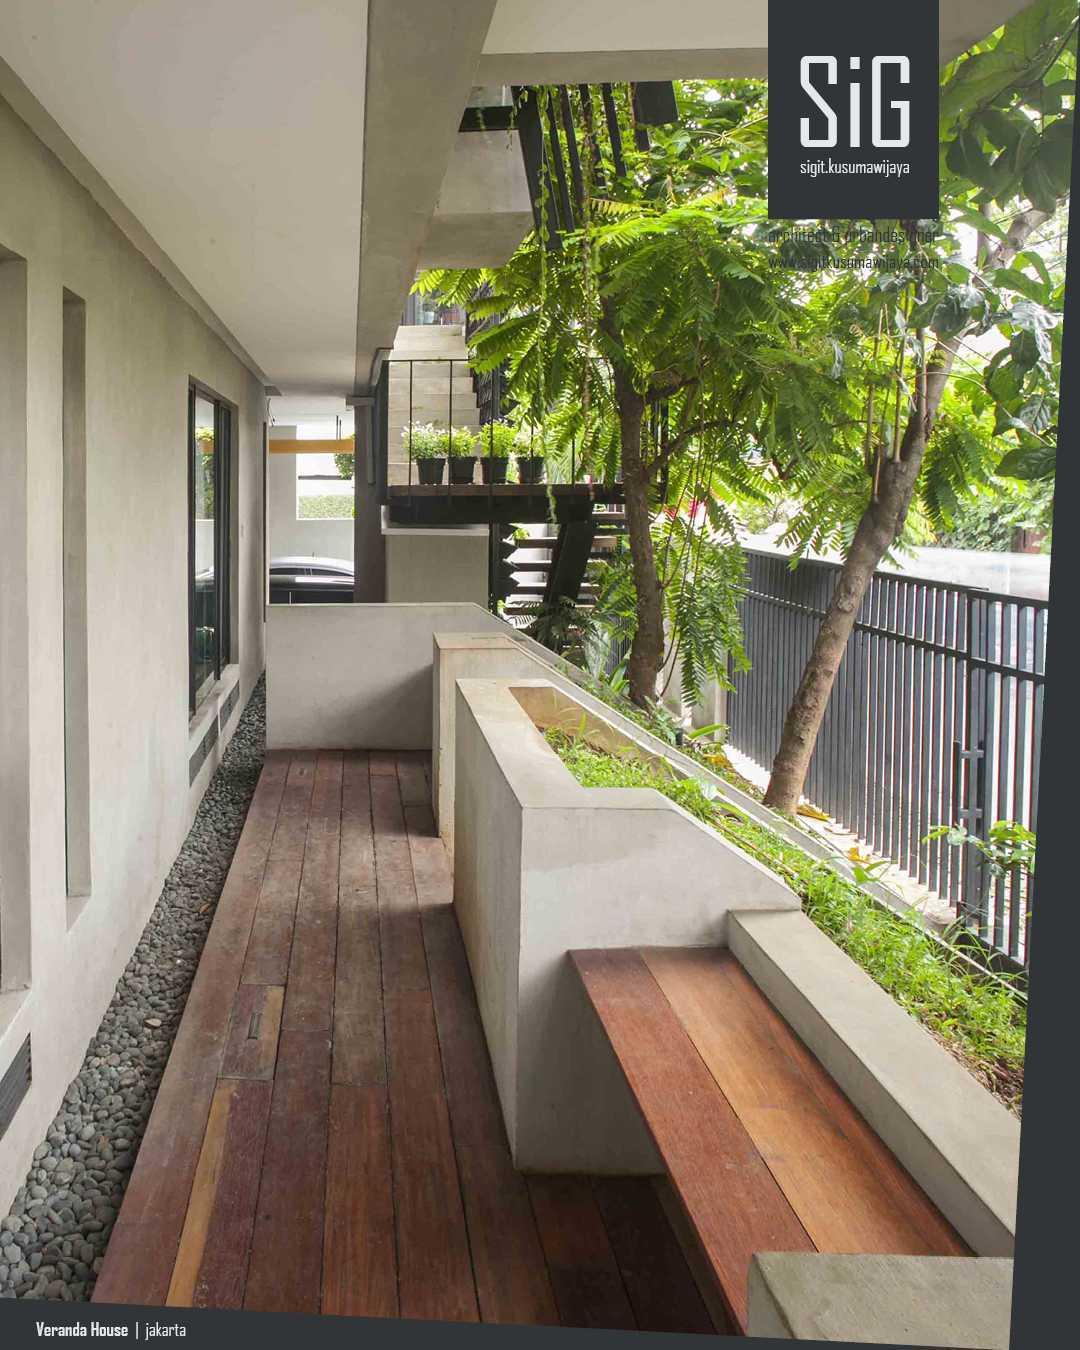 Sigit.kusumawijaya   Architect & Urbandesigner Rumah Beranda - Green Boarding House Cipete, South Jakarta, Indonesia Cipete, South Jakarta, Indonesia Sigitkusumawijaya-Architect-Urbandesigner-Rumah-Beranda-Green-Boarding-House Industrial  55006